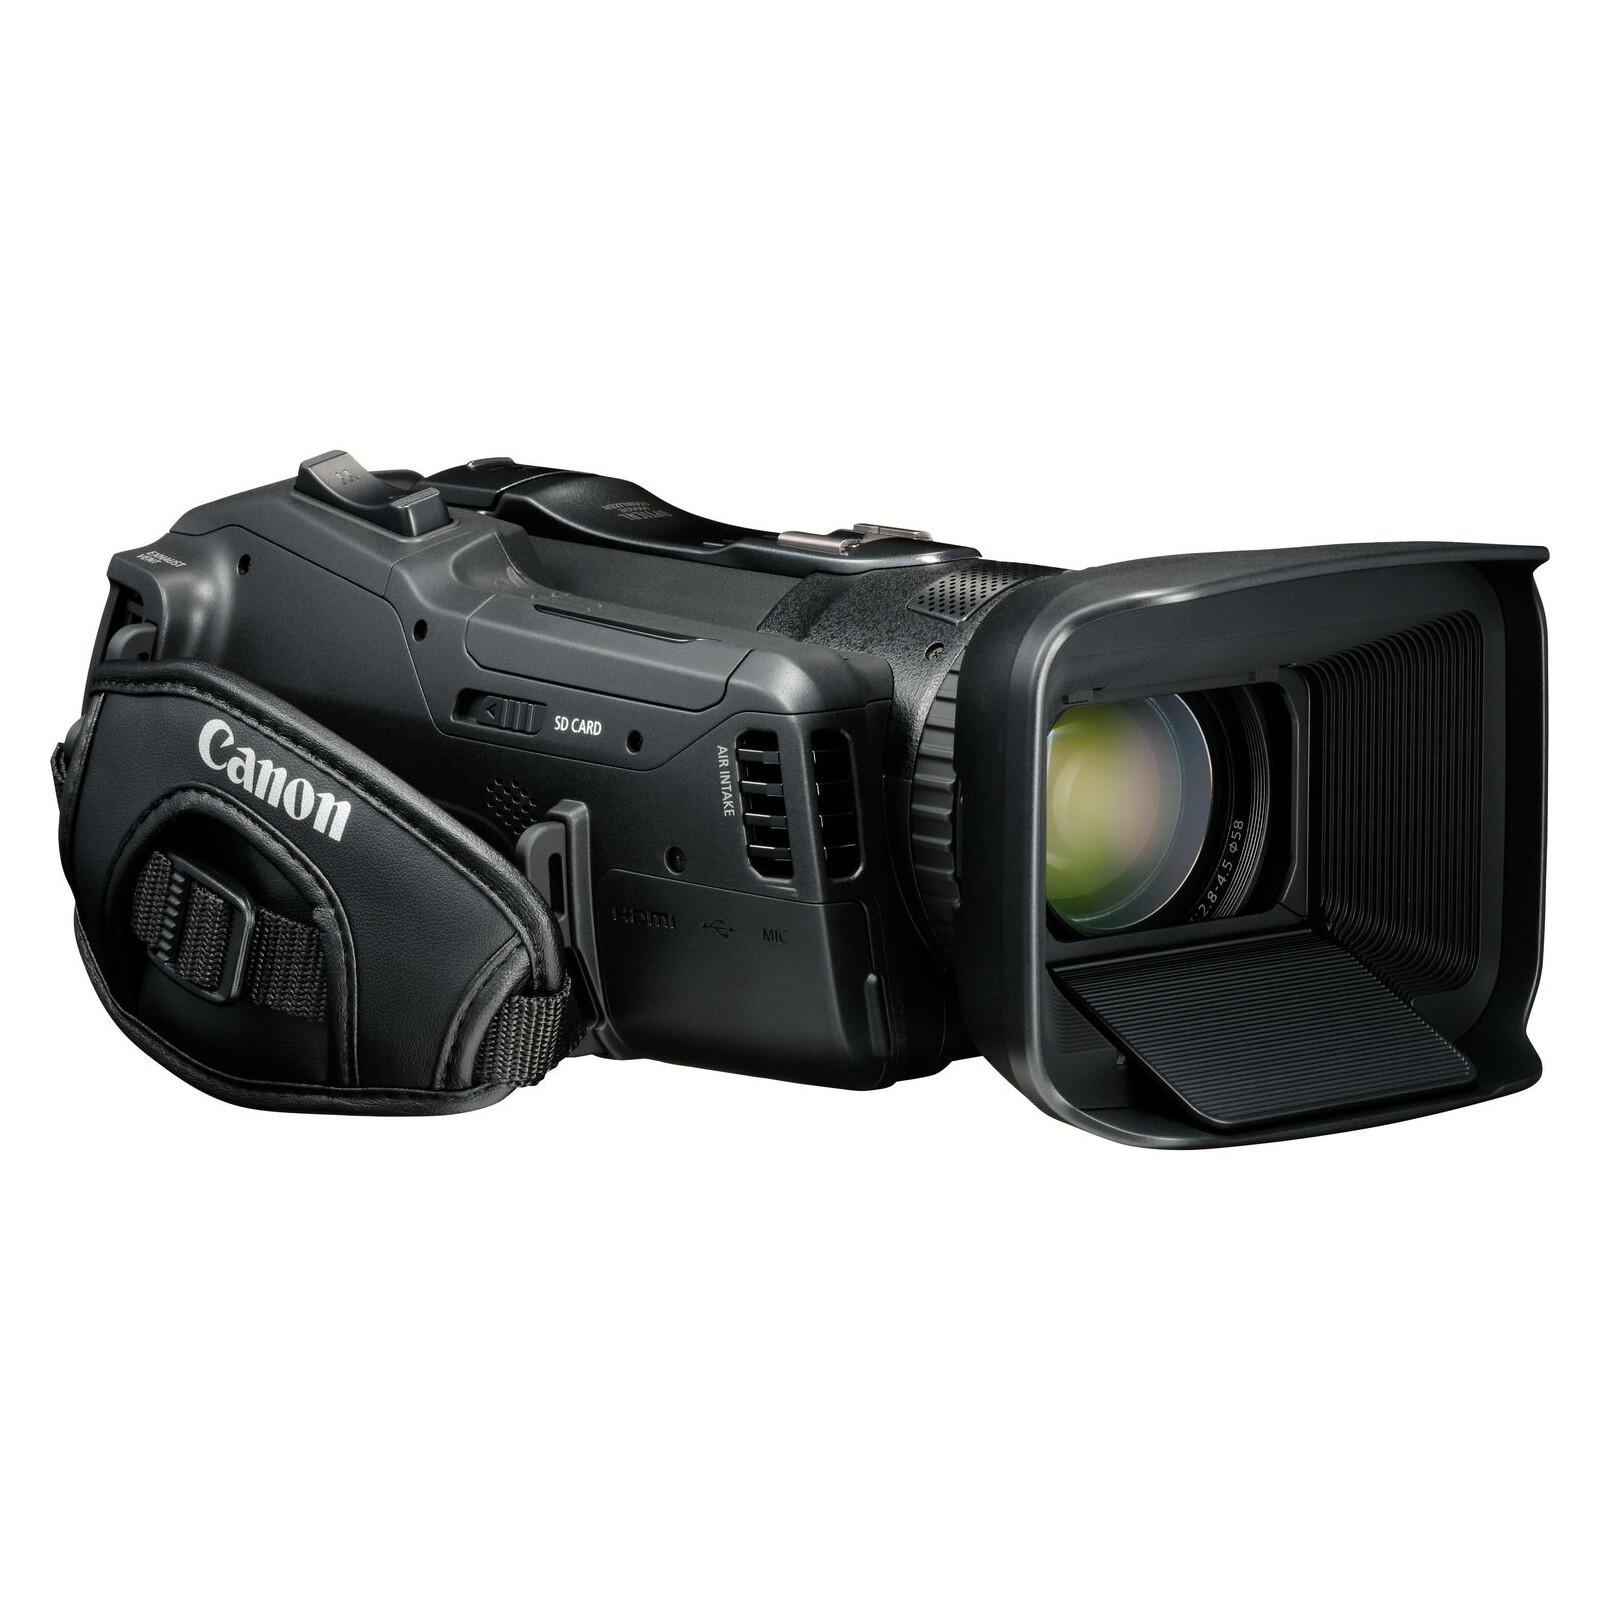 Canon Legria GX-10 4K Camcorder